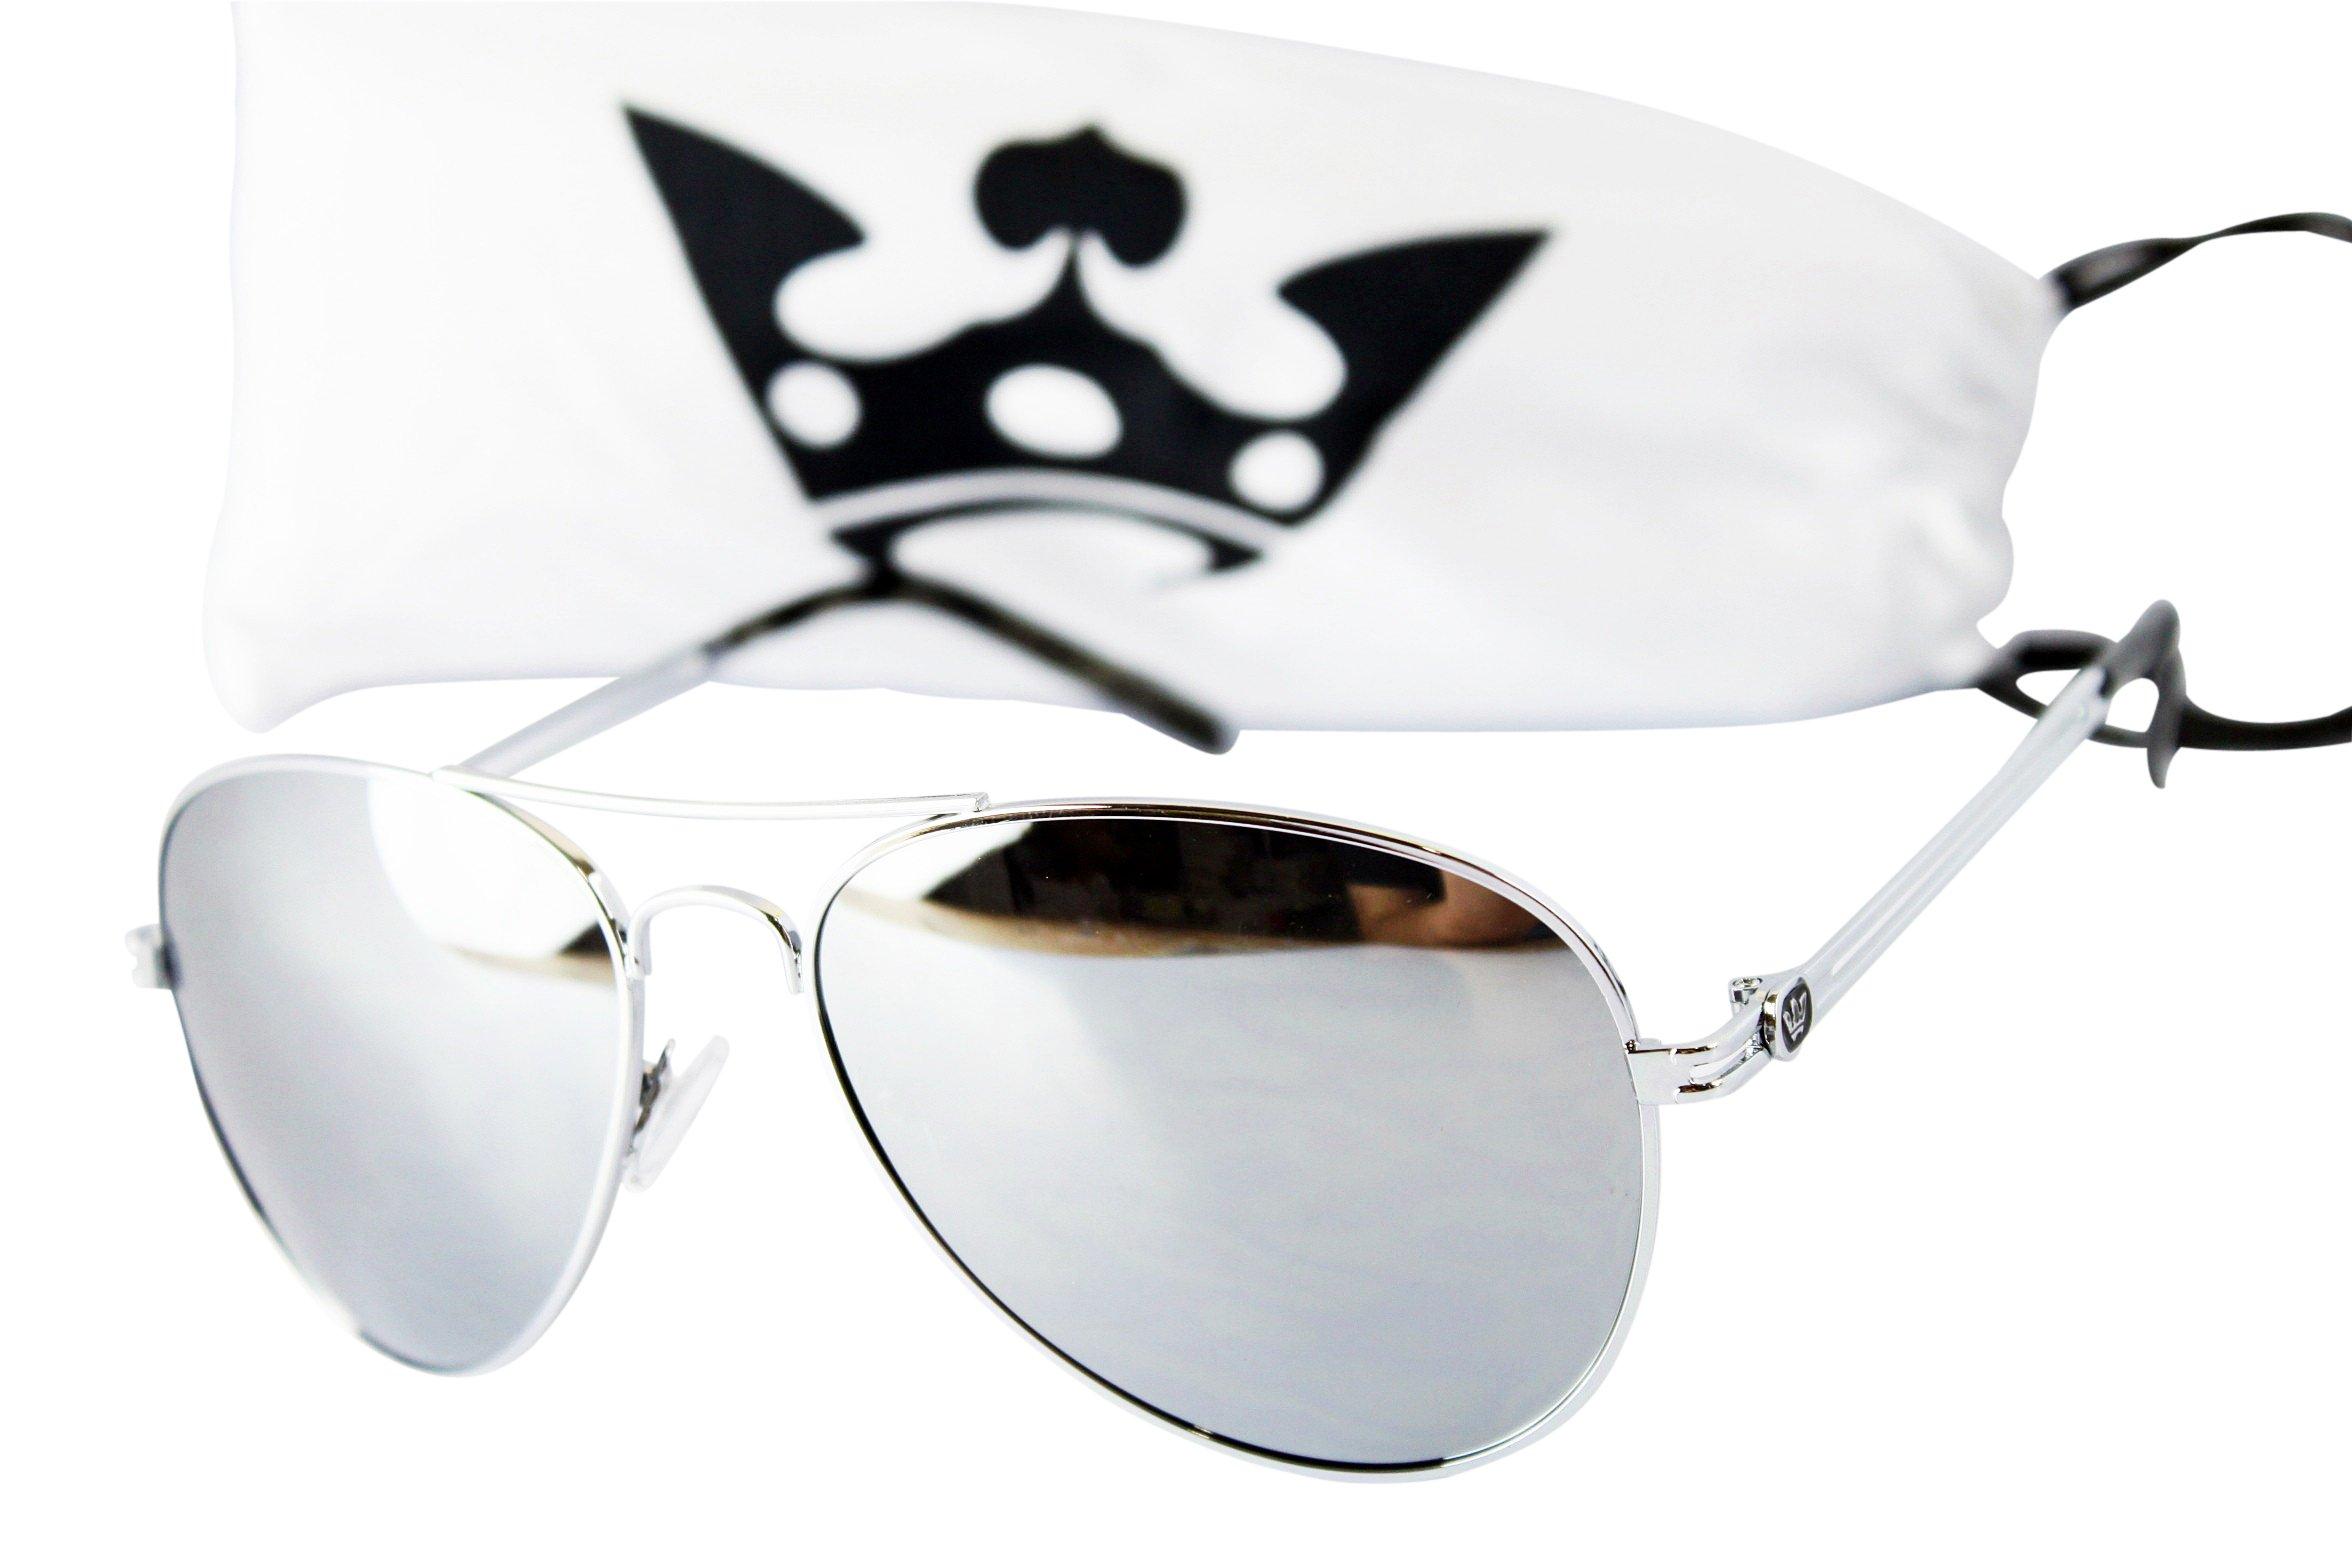 T011-cp Triple Crown Aviator Pilot CHP Metal Sunglasses (Silver-mirrored)